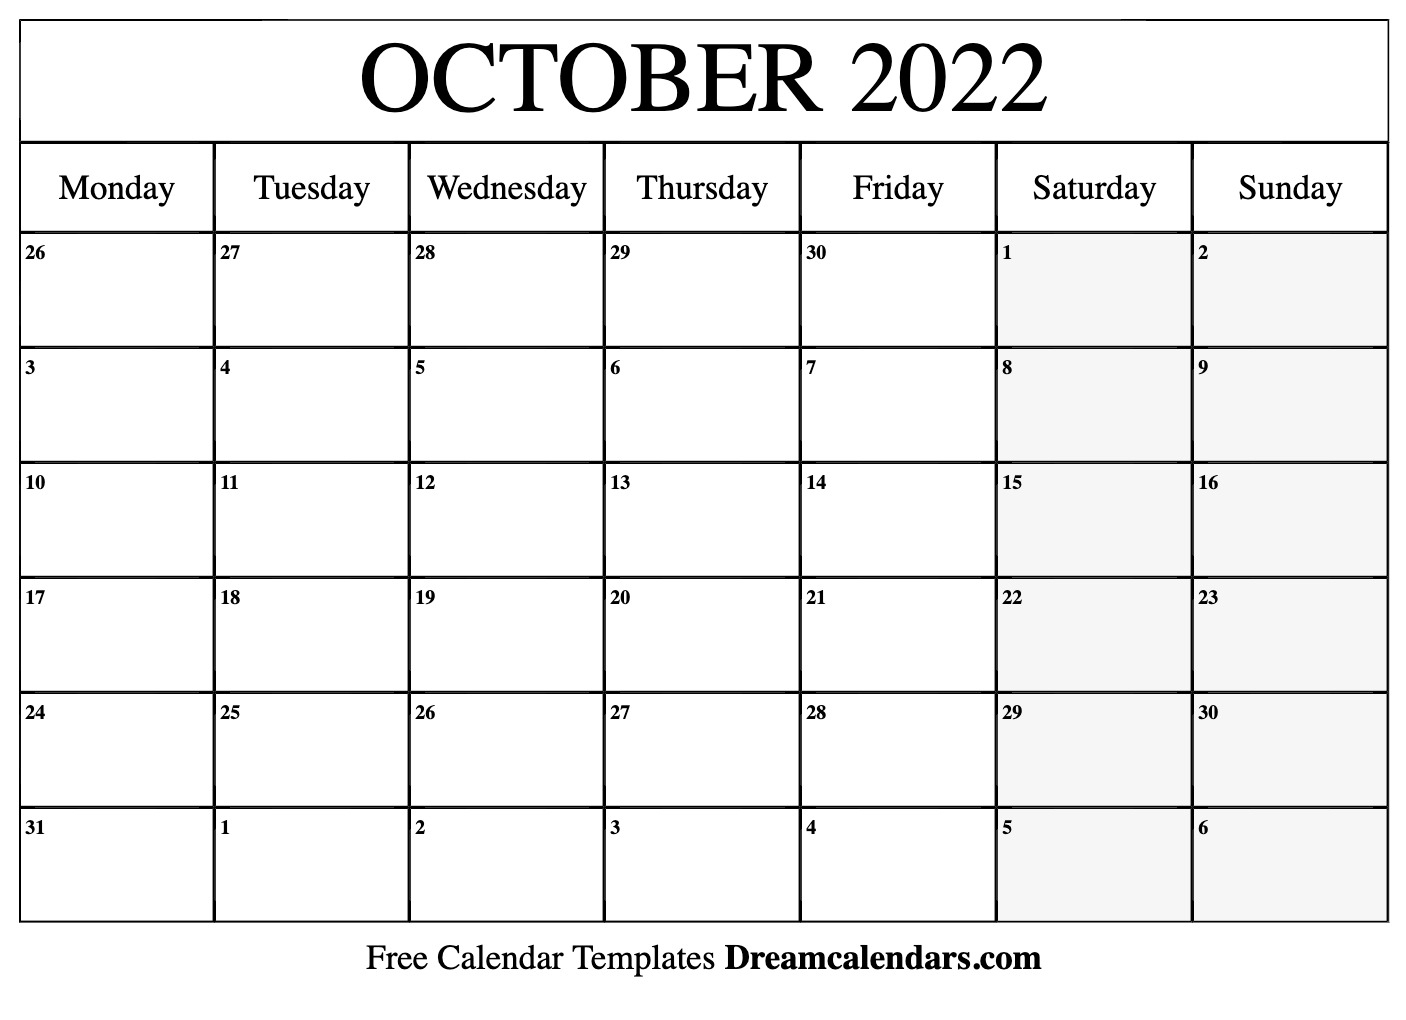 October 2022 Calendar   Free Blank Printable Templates For Printable Calendar October 2022 To January 2022